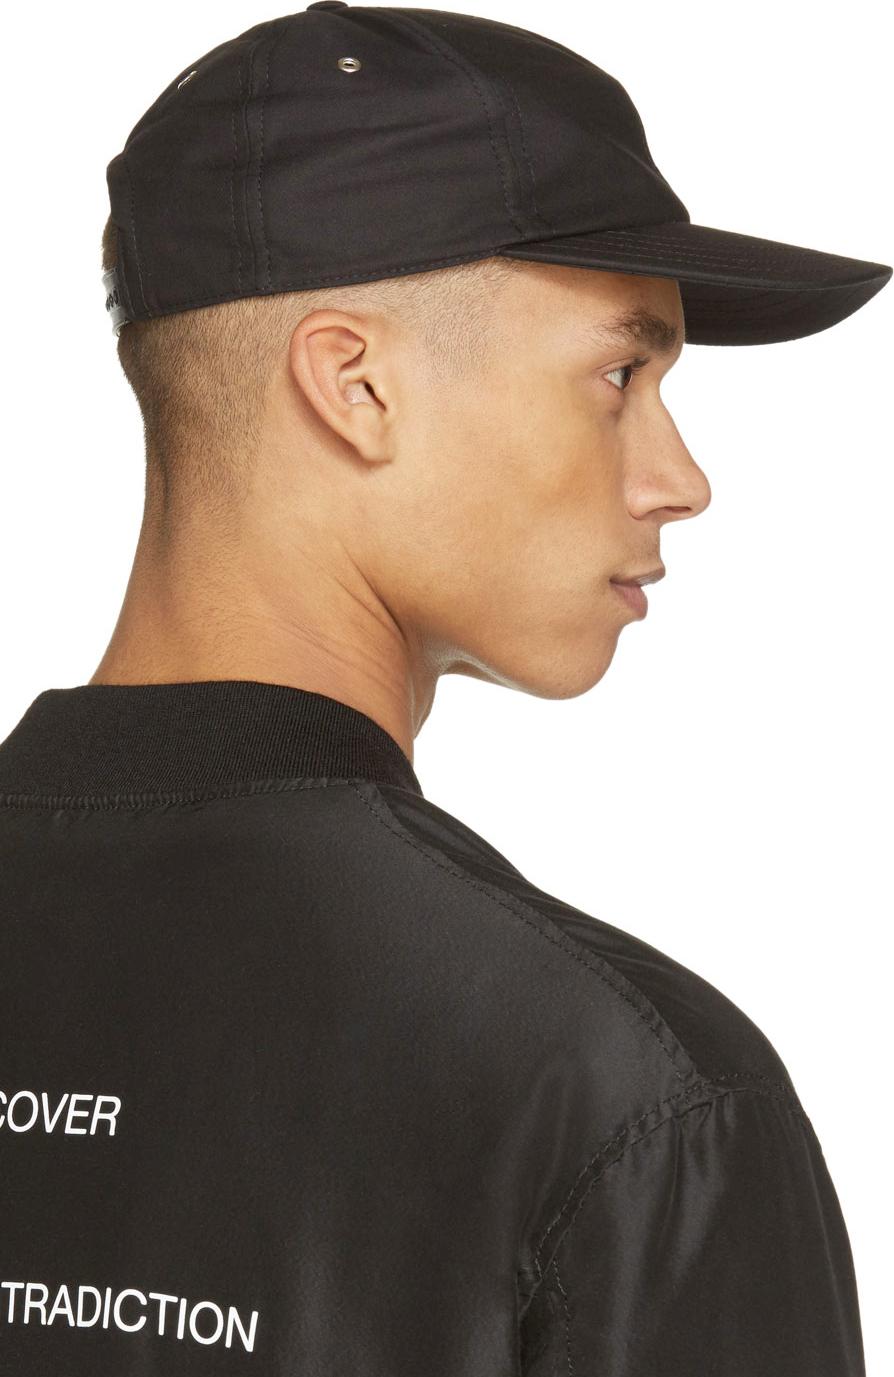 d3034611f9e63 AMI Blac Classic Baseball Cap in Black for Men - Lyst